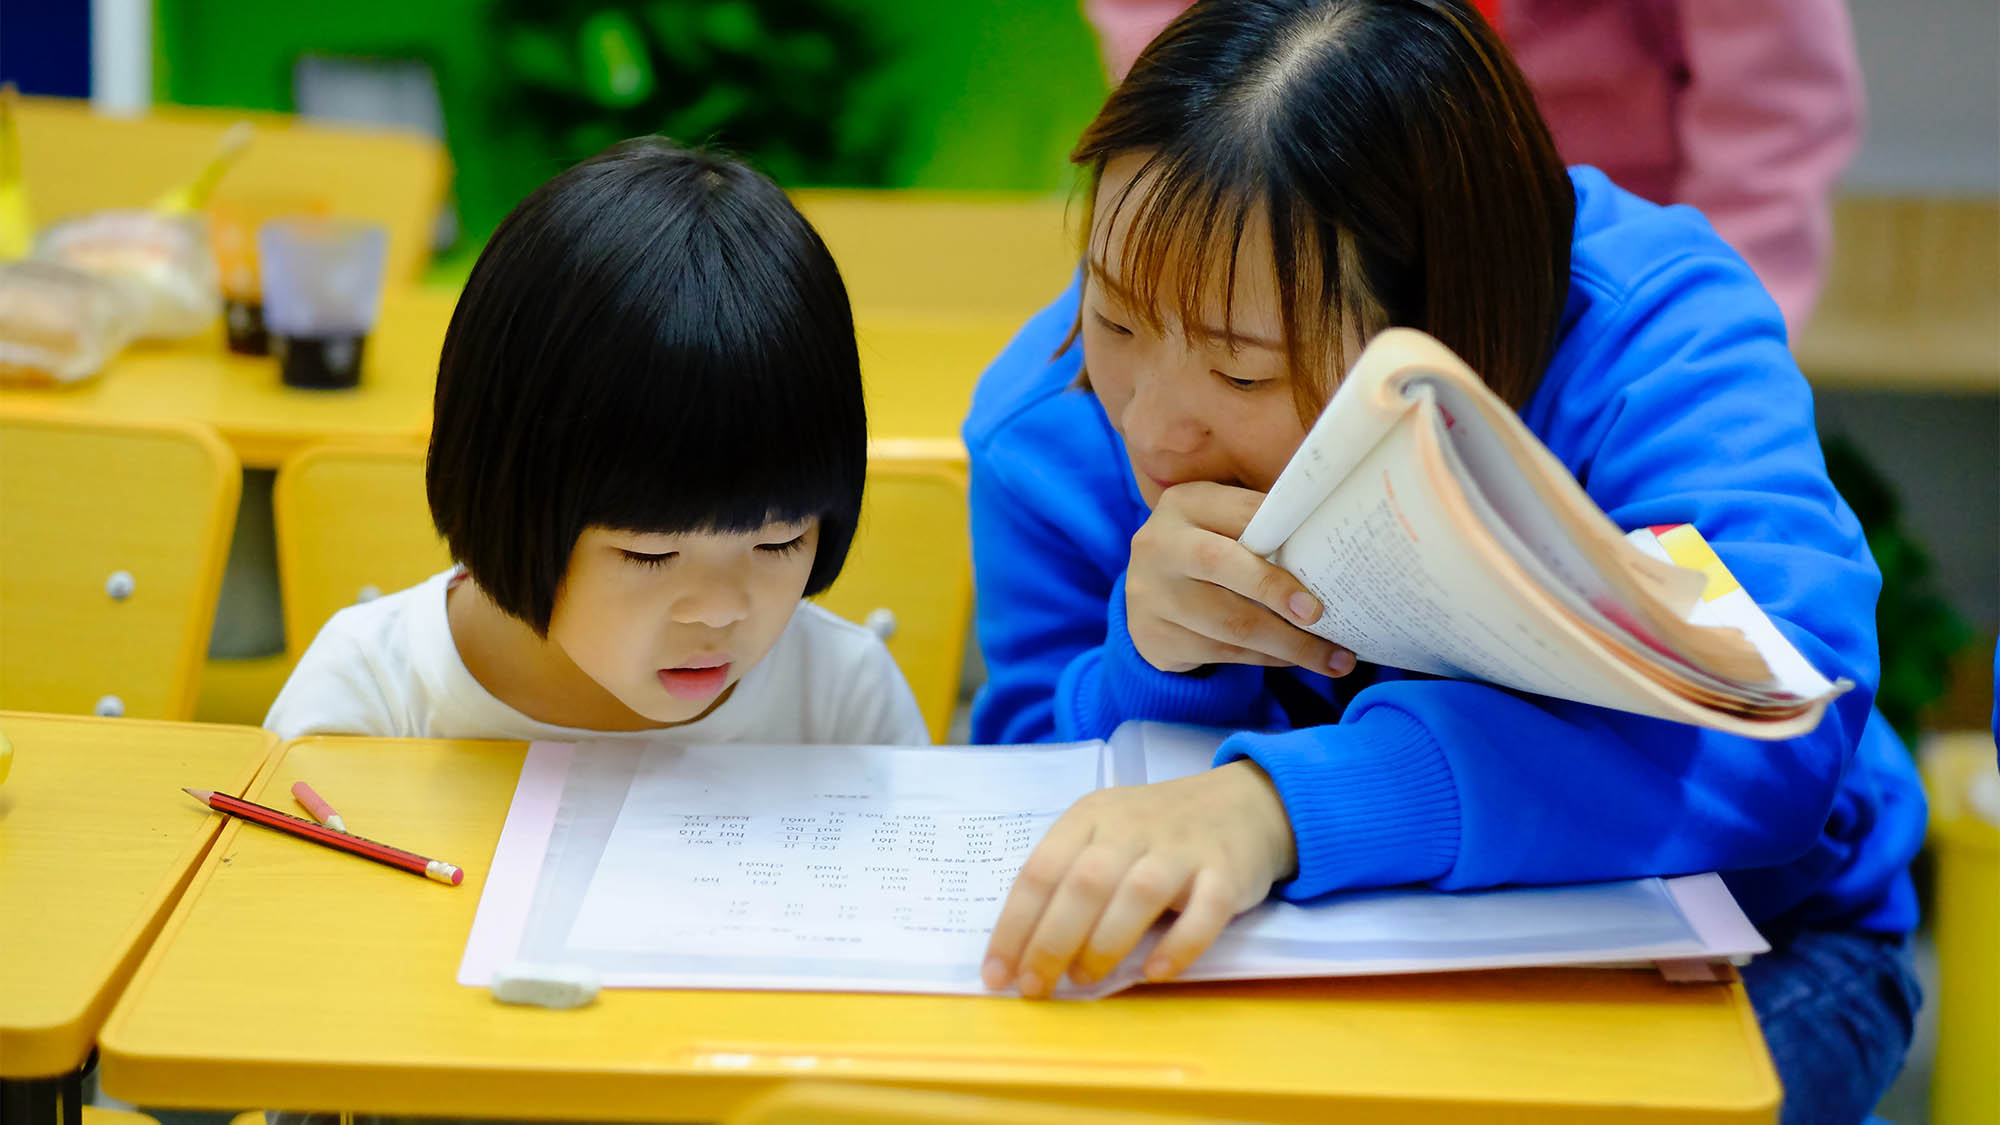 Asian woman tutoring Asian girl at desk